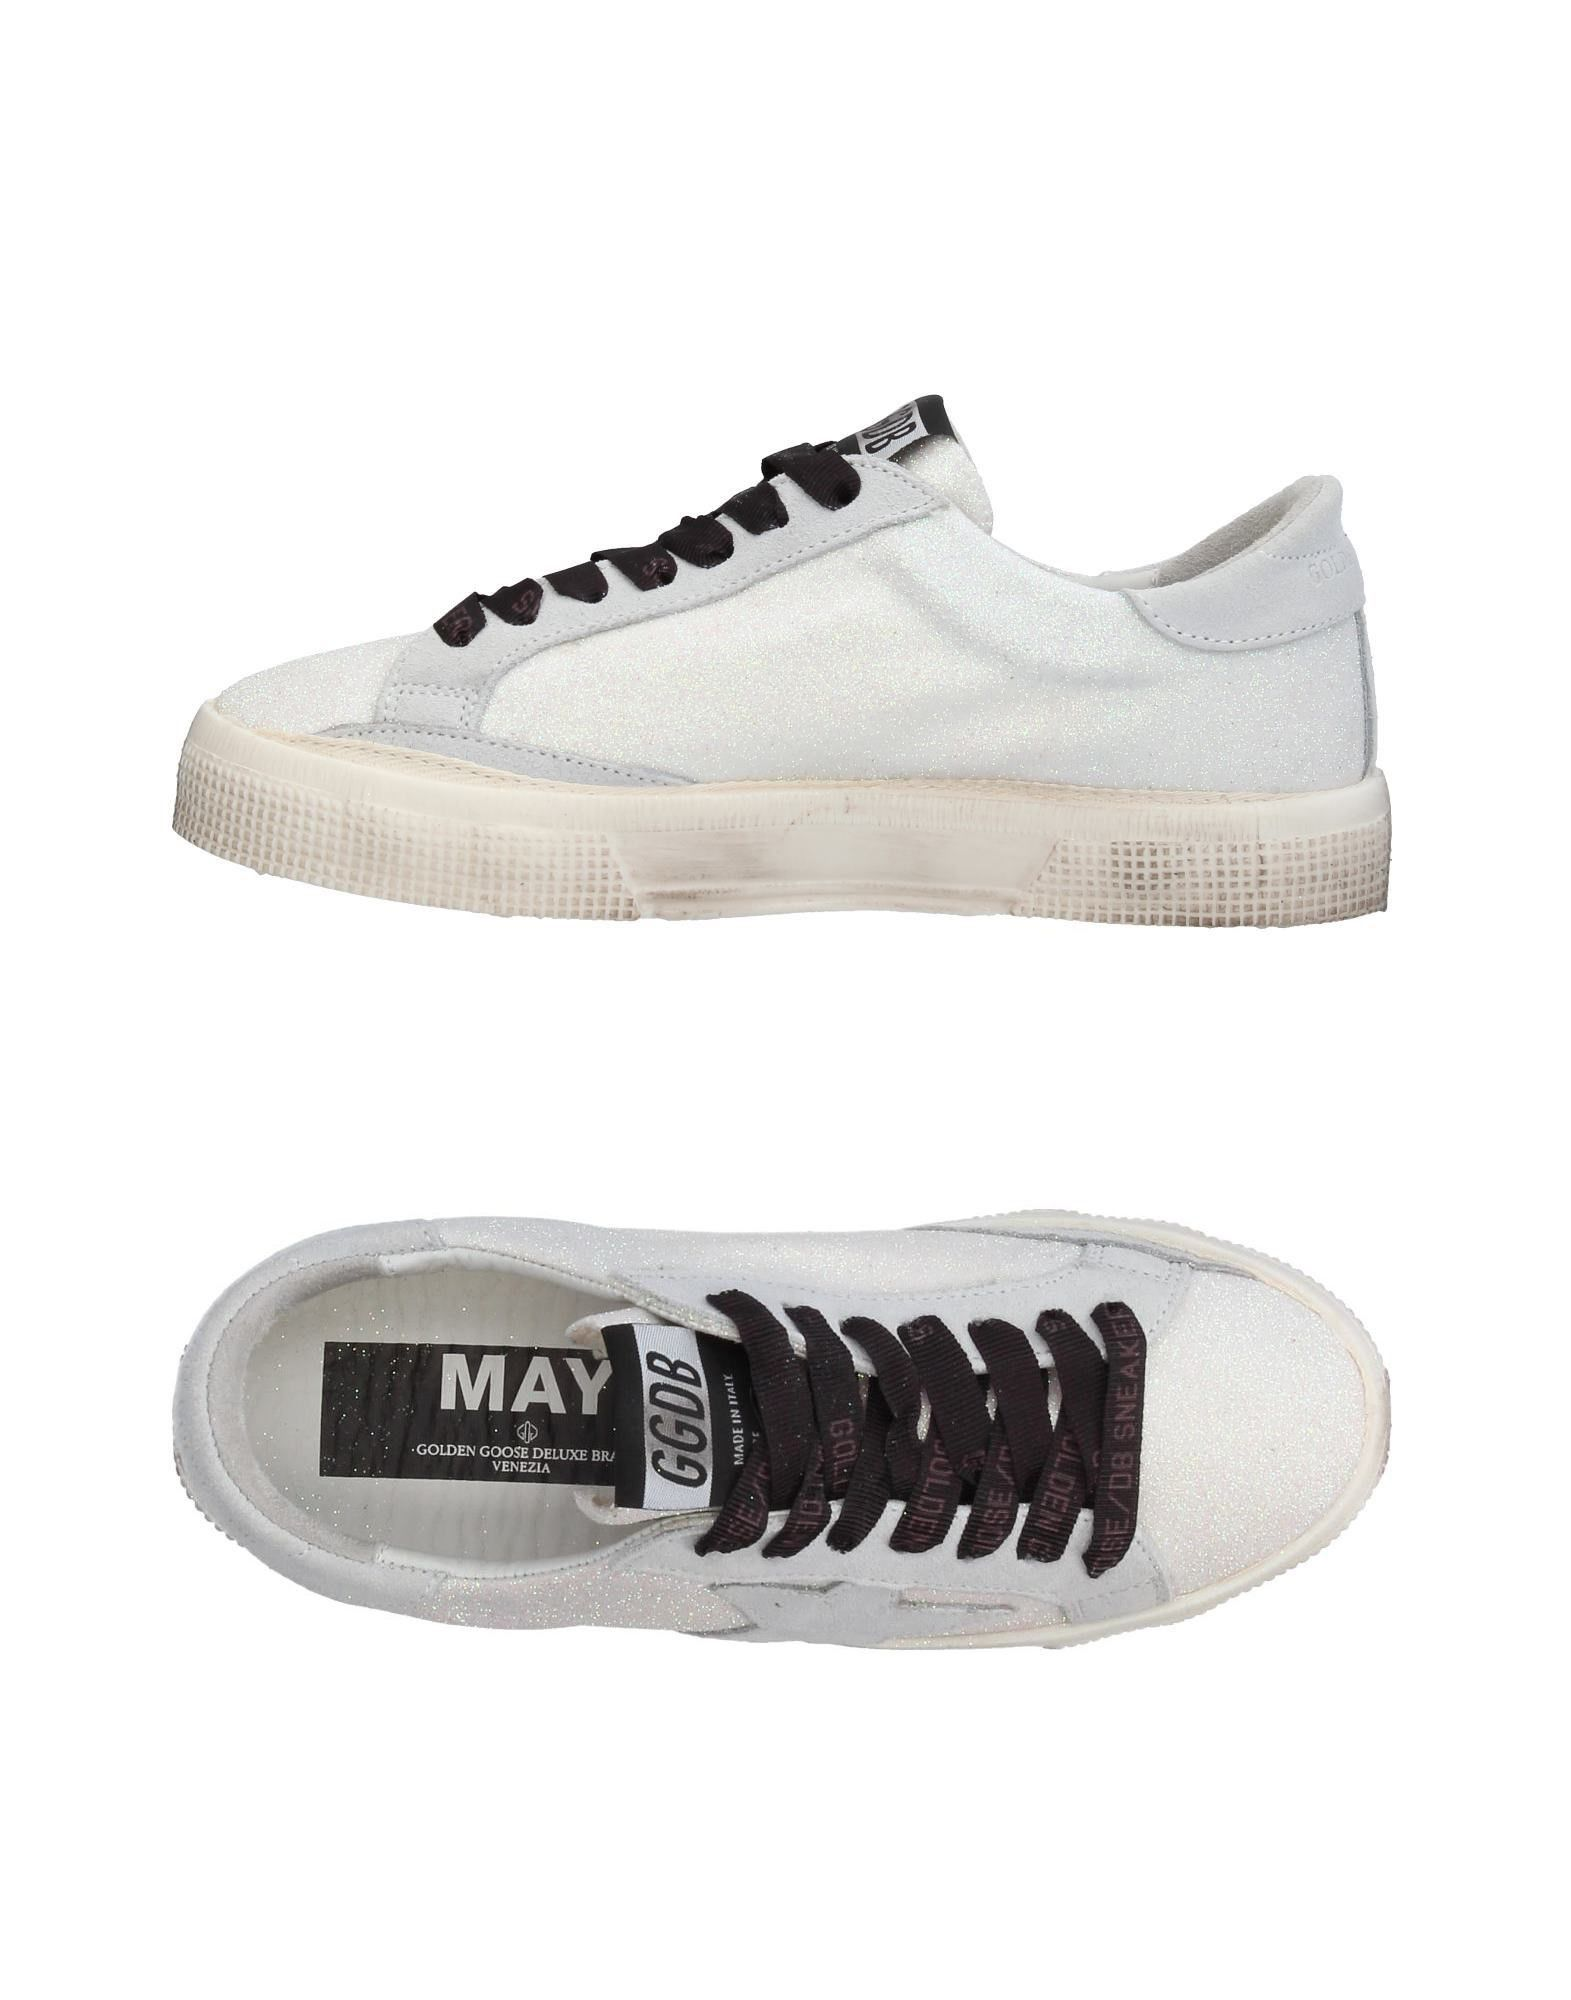 Golden Goose Deluxe Brand Sneakers Damen  11385457TWGut aussehende strapazierfähige Schuhe